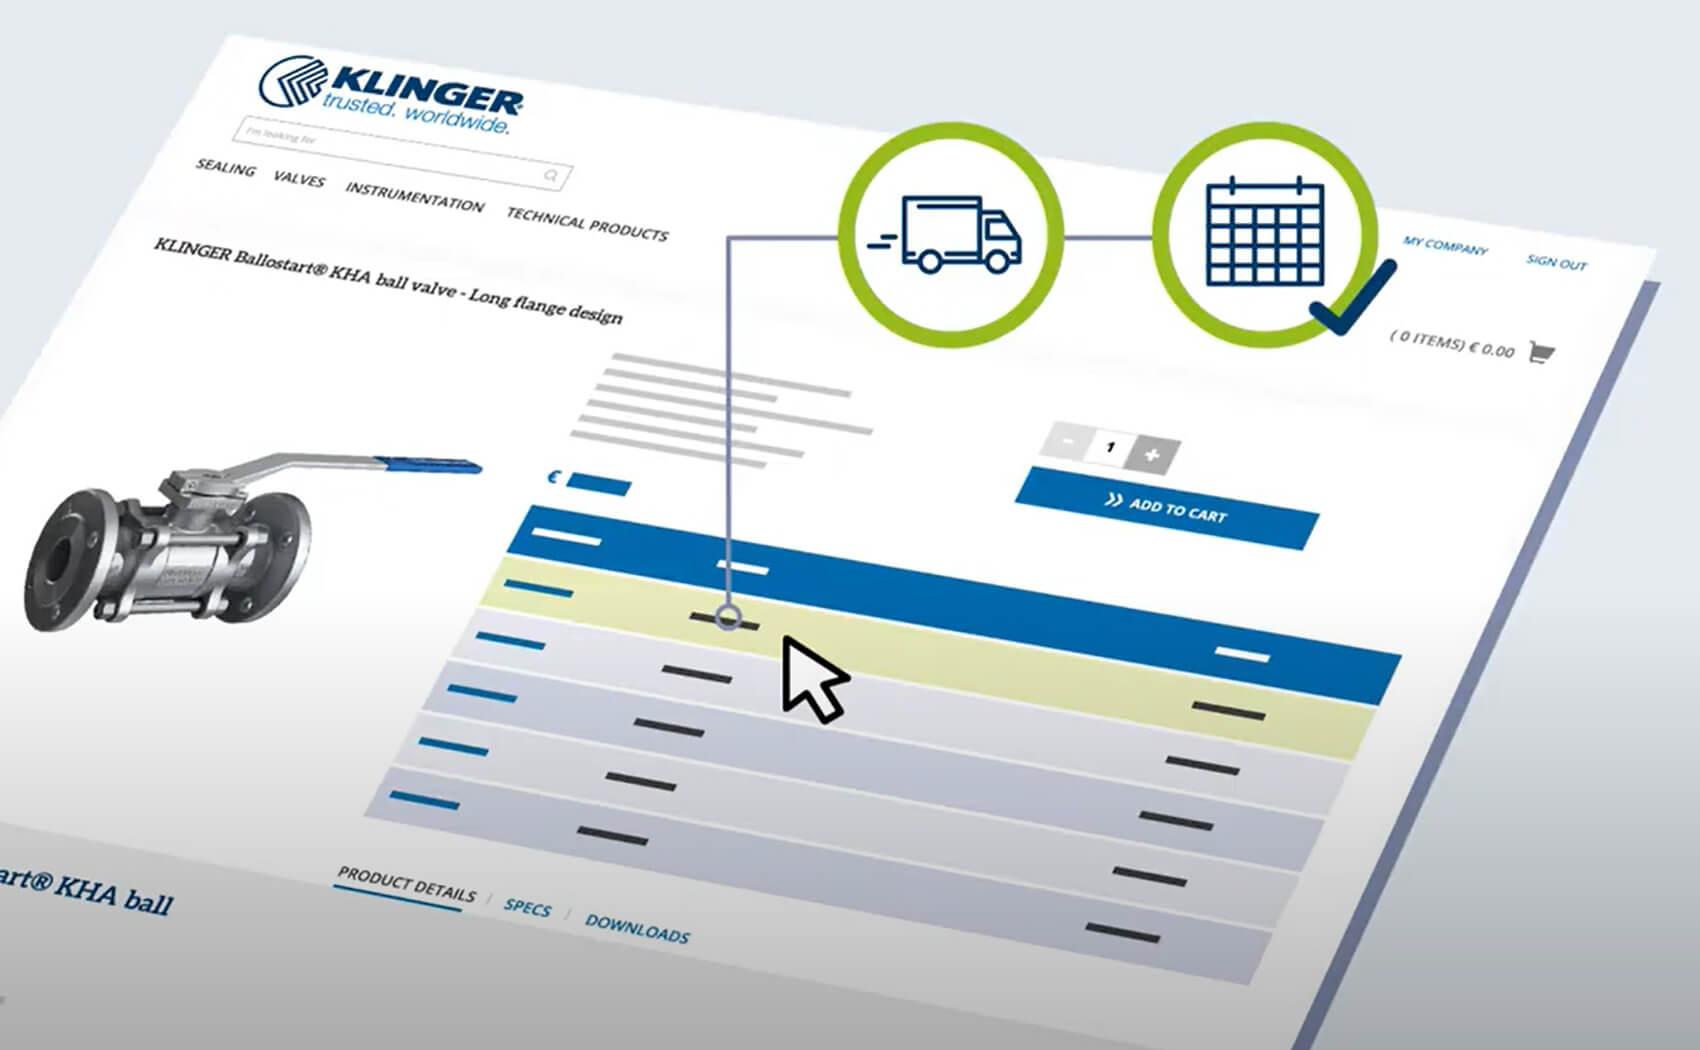 KLINGER Online Shop - B2B Shop for Sealing and Fluid Technology